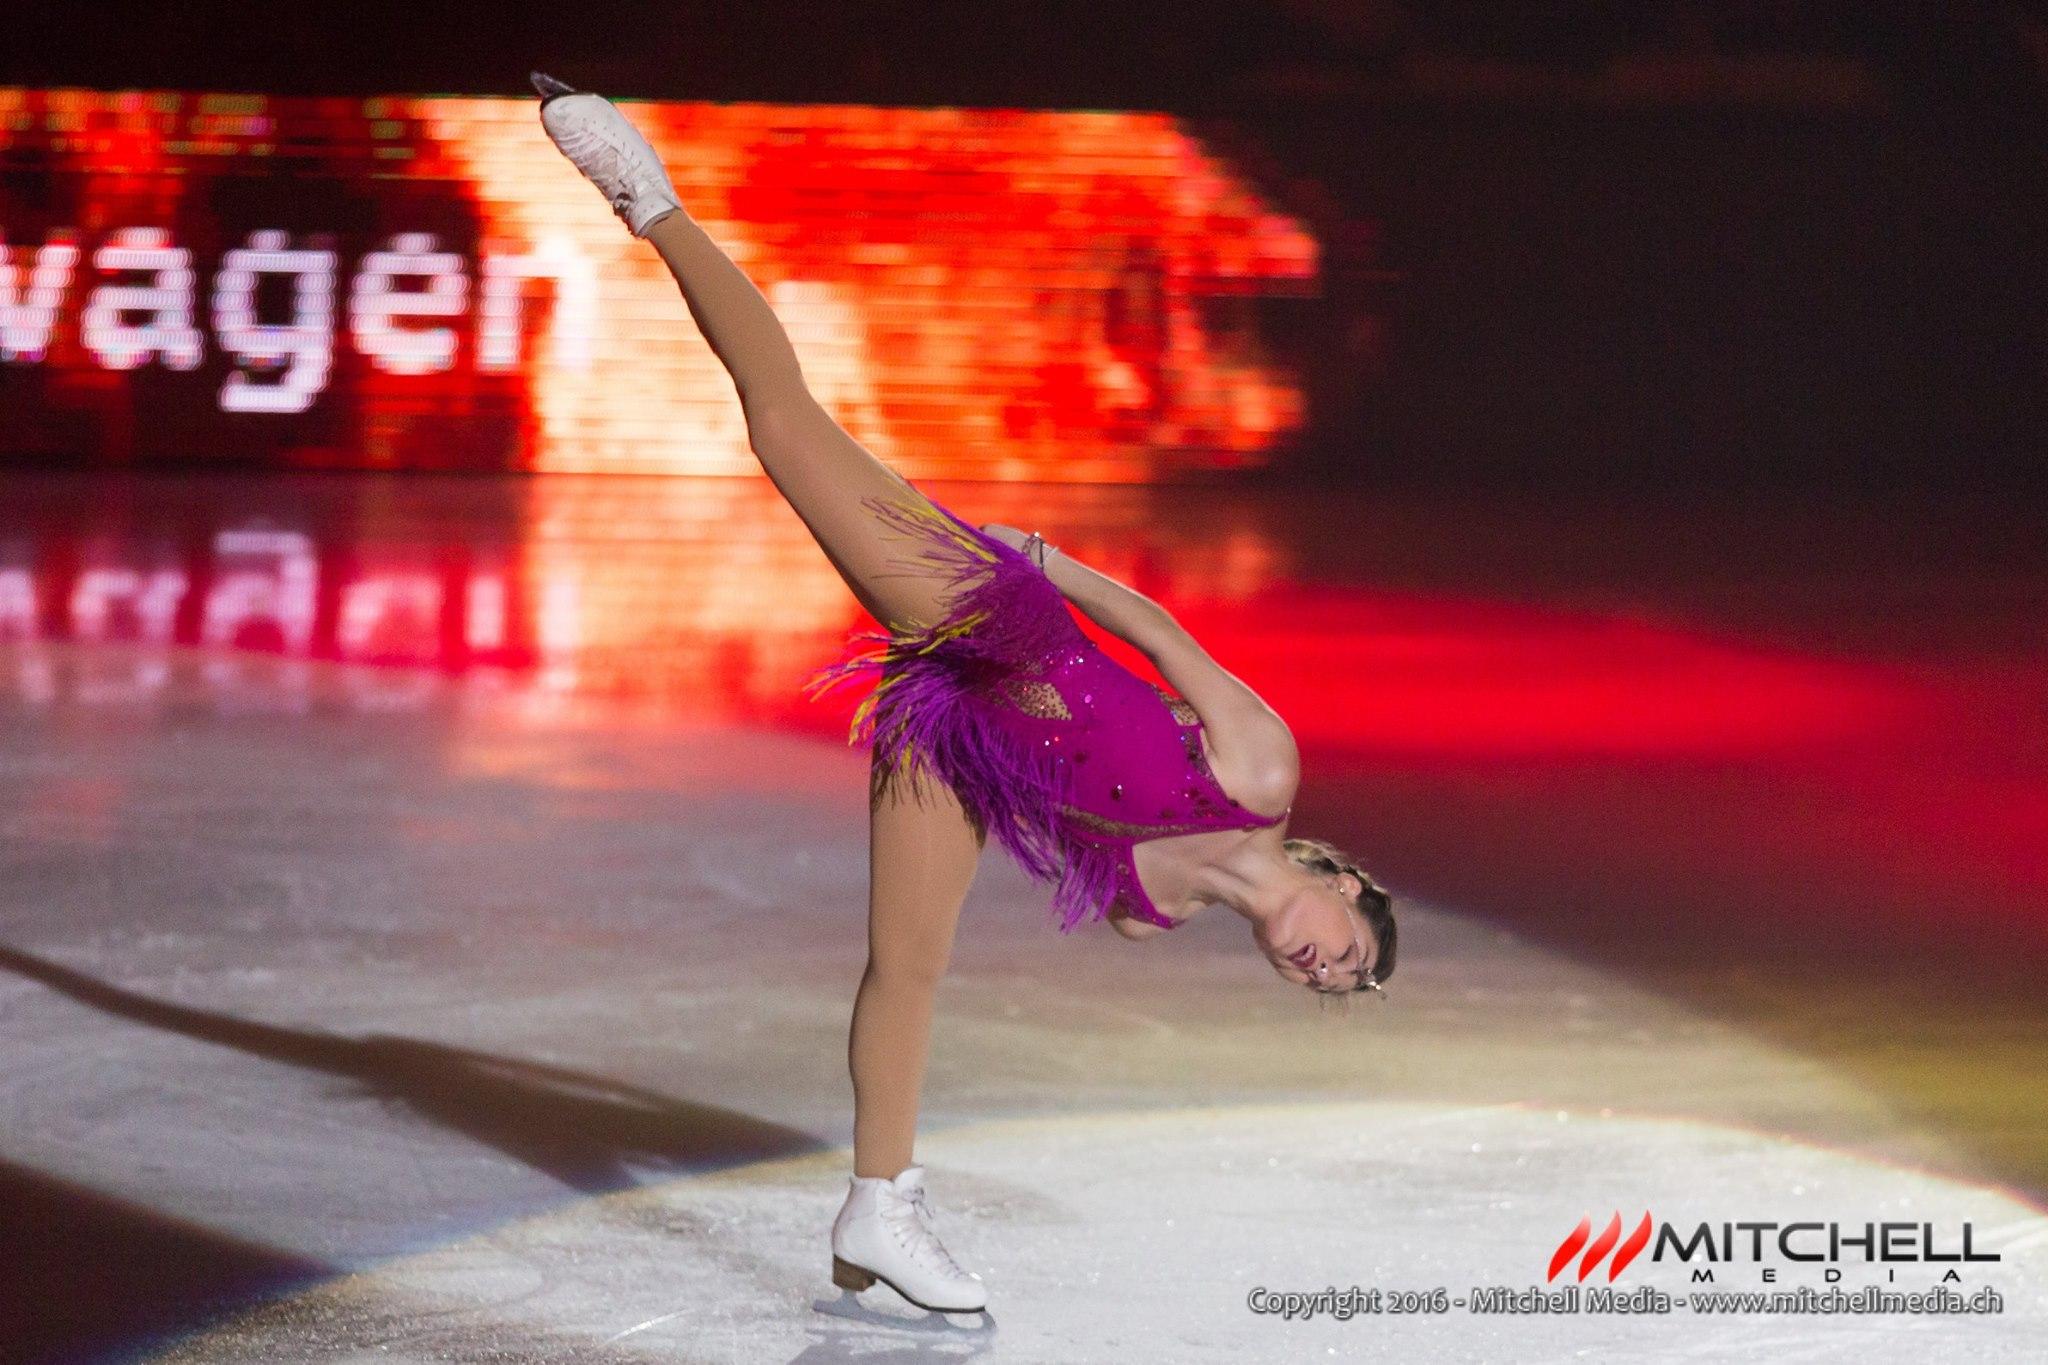 Аделина Сотникова - 2 - Страница 6 X1Tr1EVUQ3M